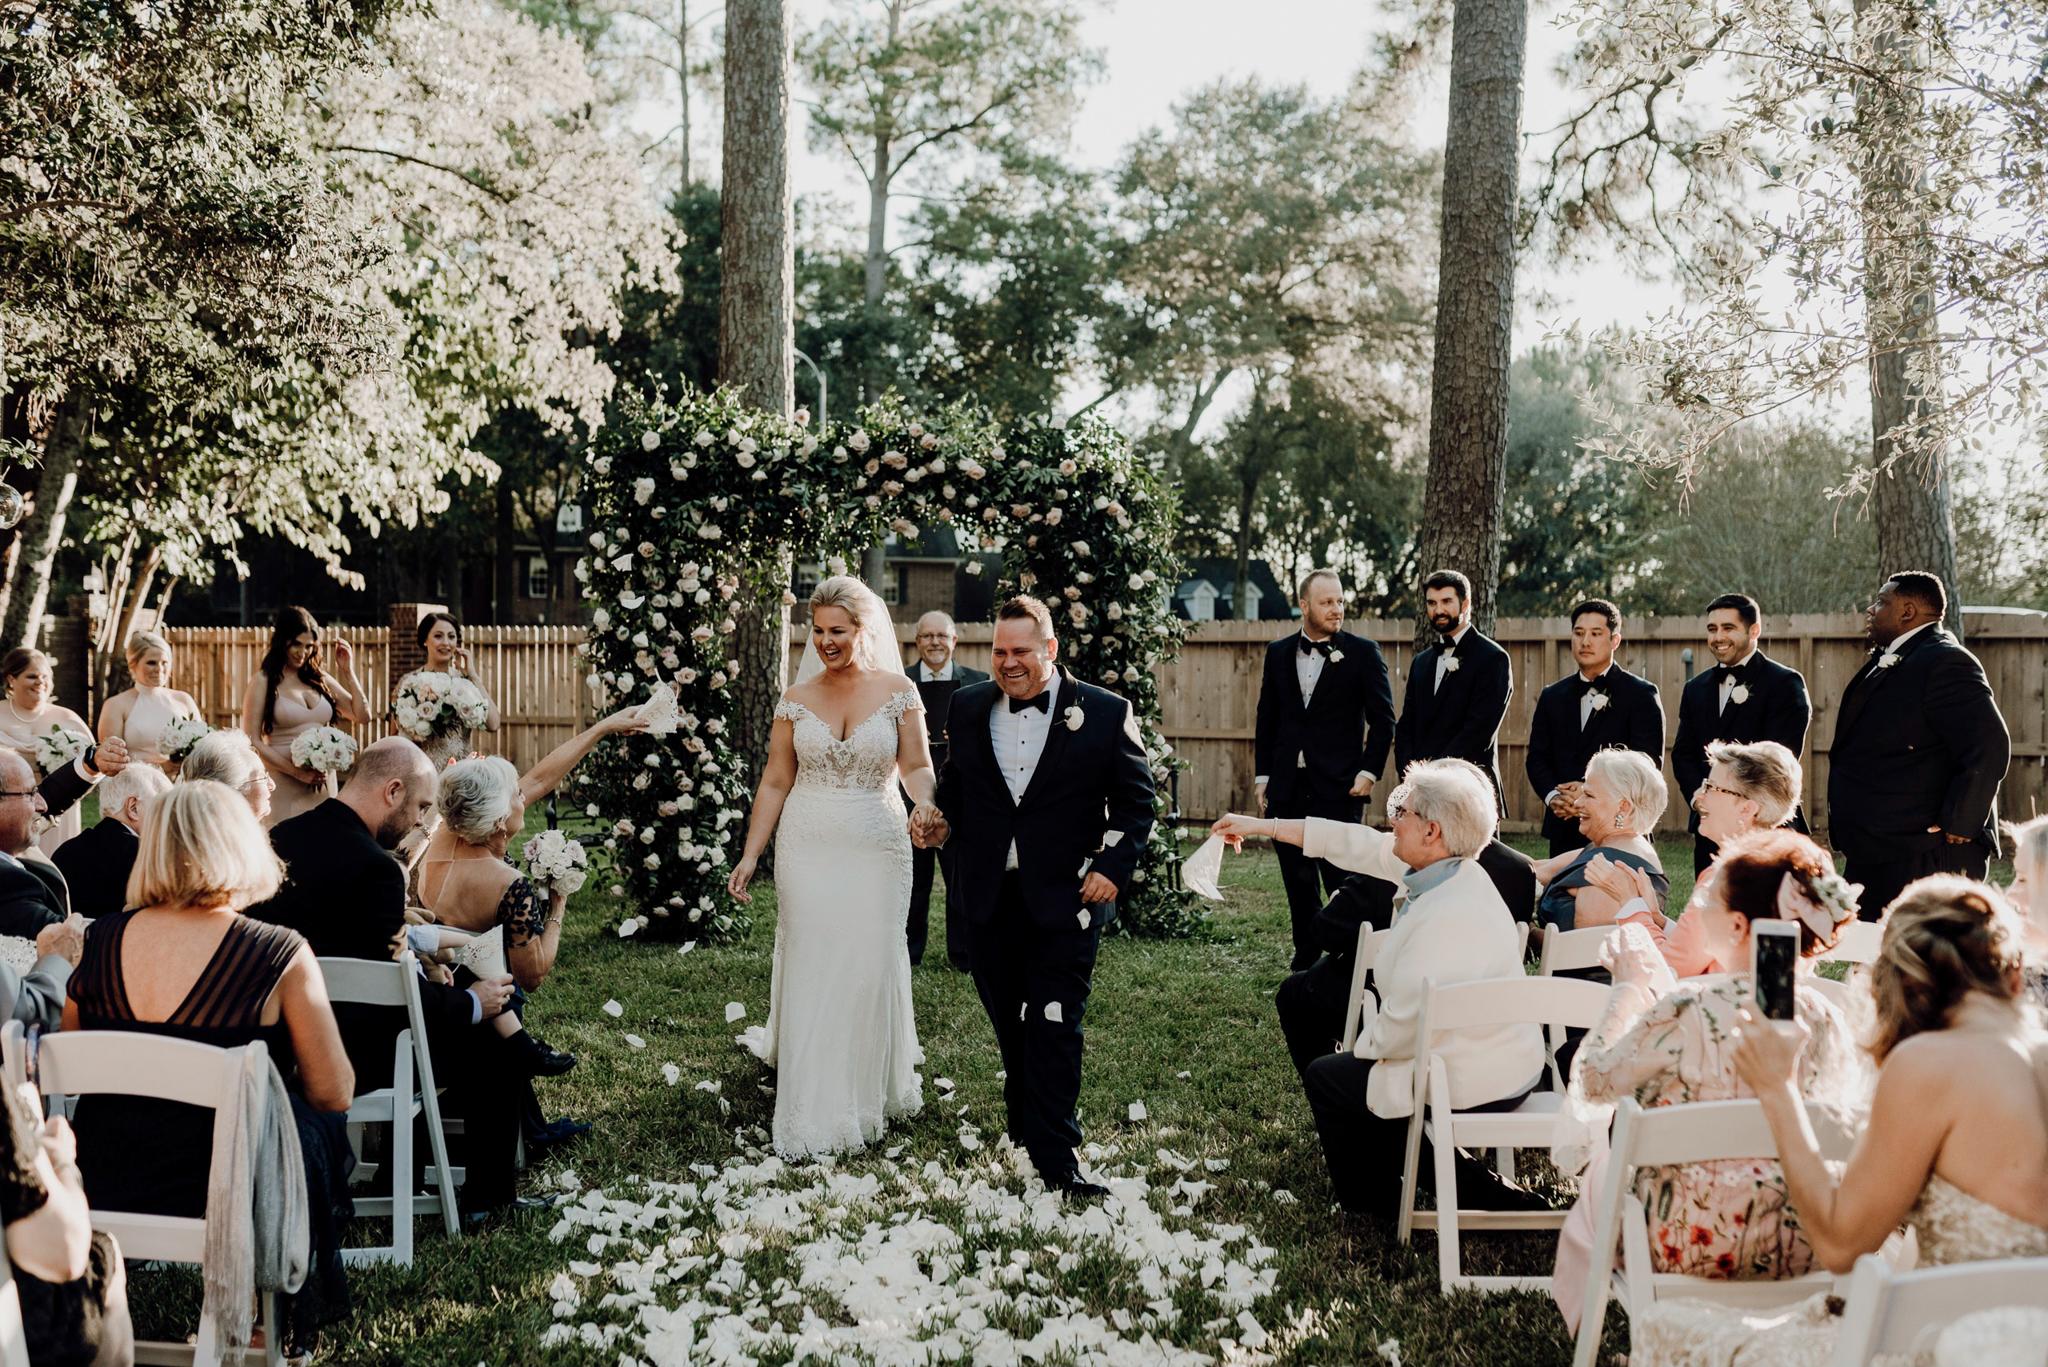 Houston Wedding Photographer-Intimate Texas Backyard Wedding- Houston Wedding Photographer -Kristen Giles Photography-48.jpg